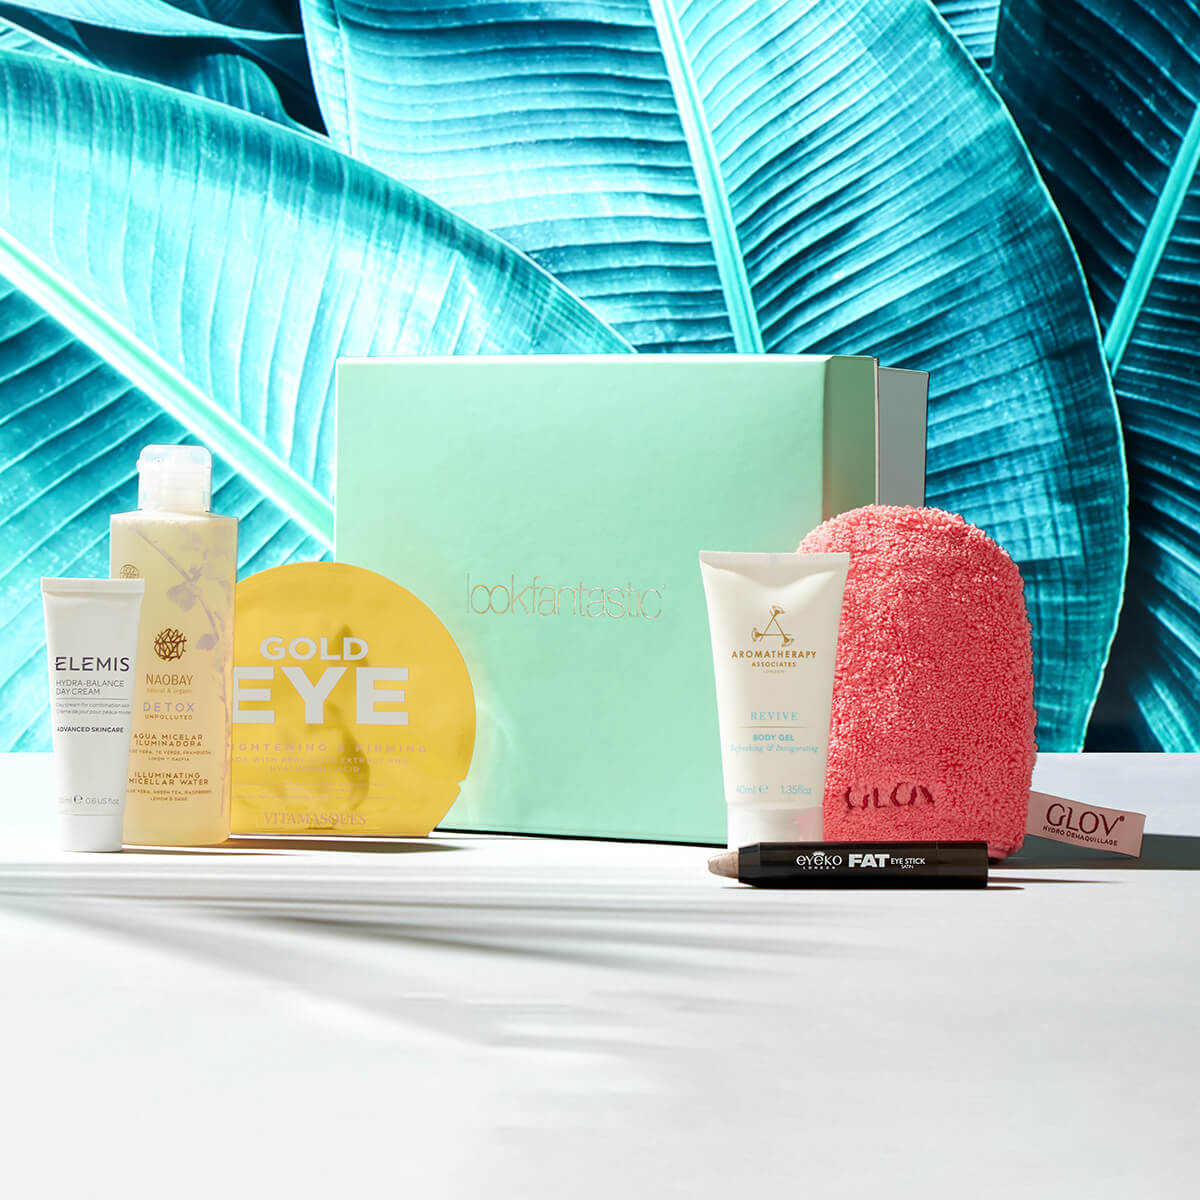 3a601df8c3143d Lookfantastic Beauty Box Abonnement - Gratis Lieferservice weltweit